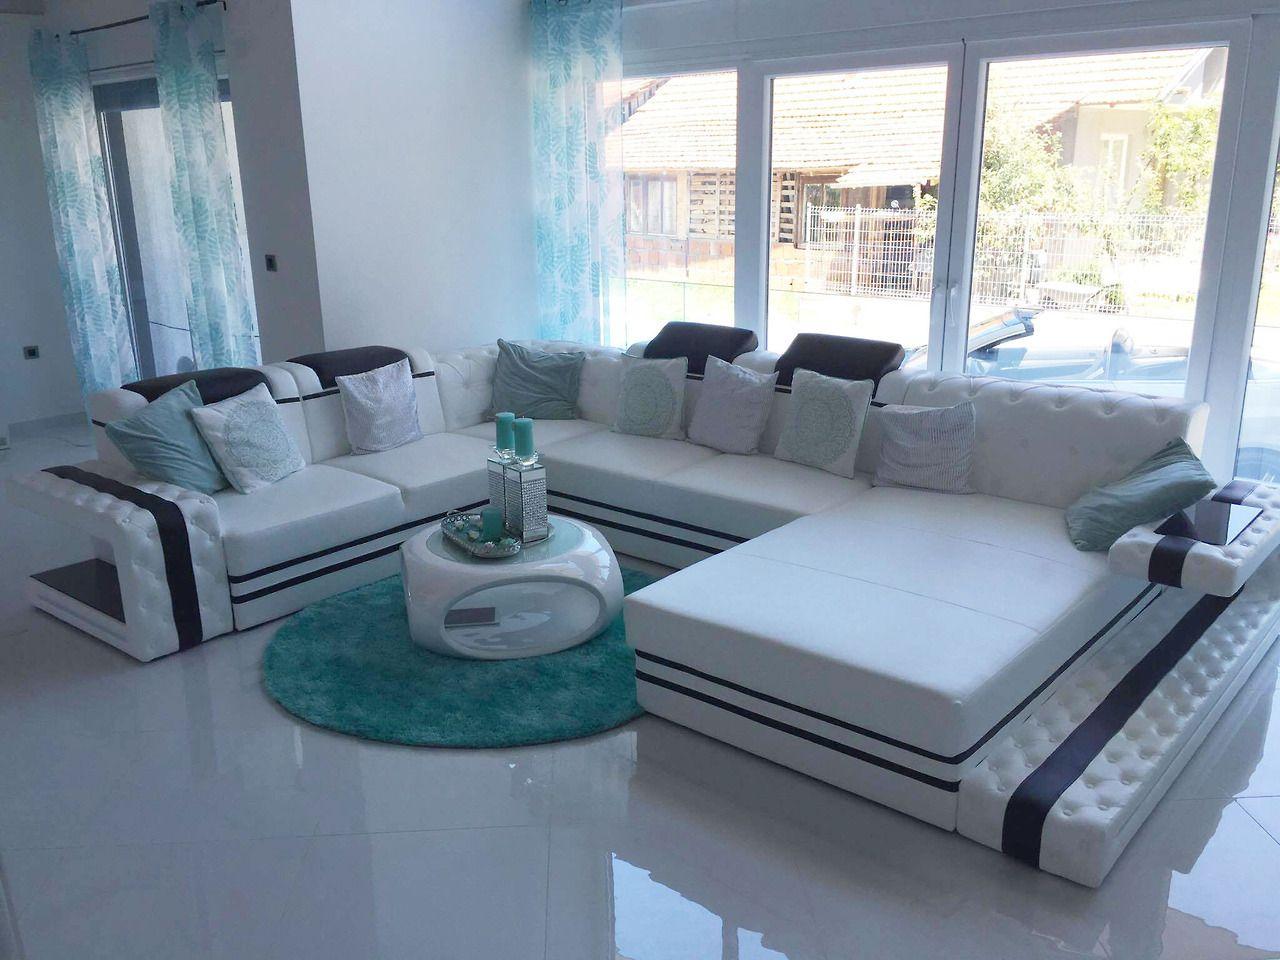 ledersofa imperial bei nativo m bel oesterreich designer. Black Bedroom Furniture Sets. Home Design Ideas